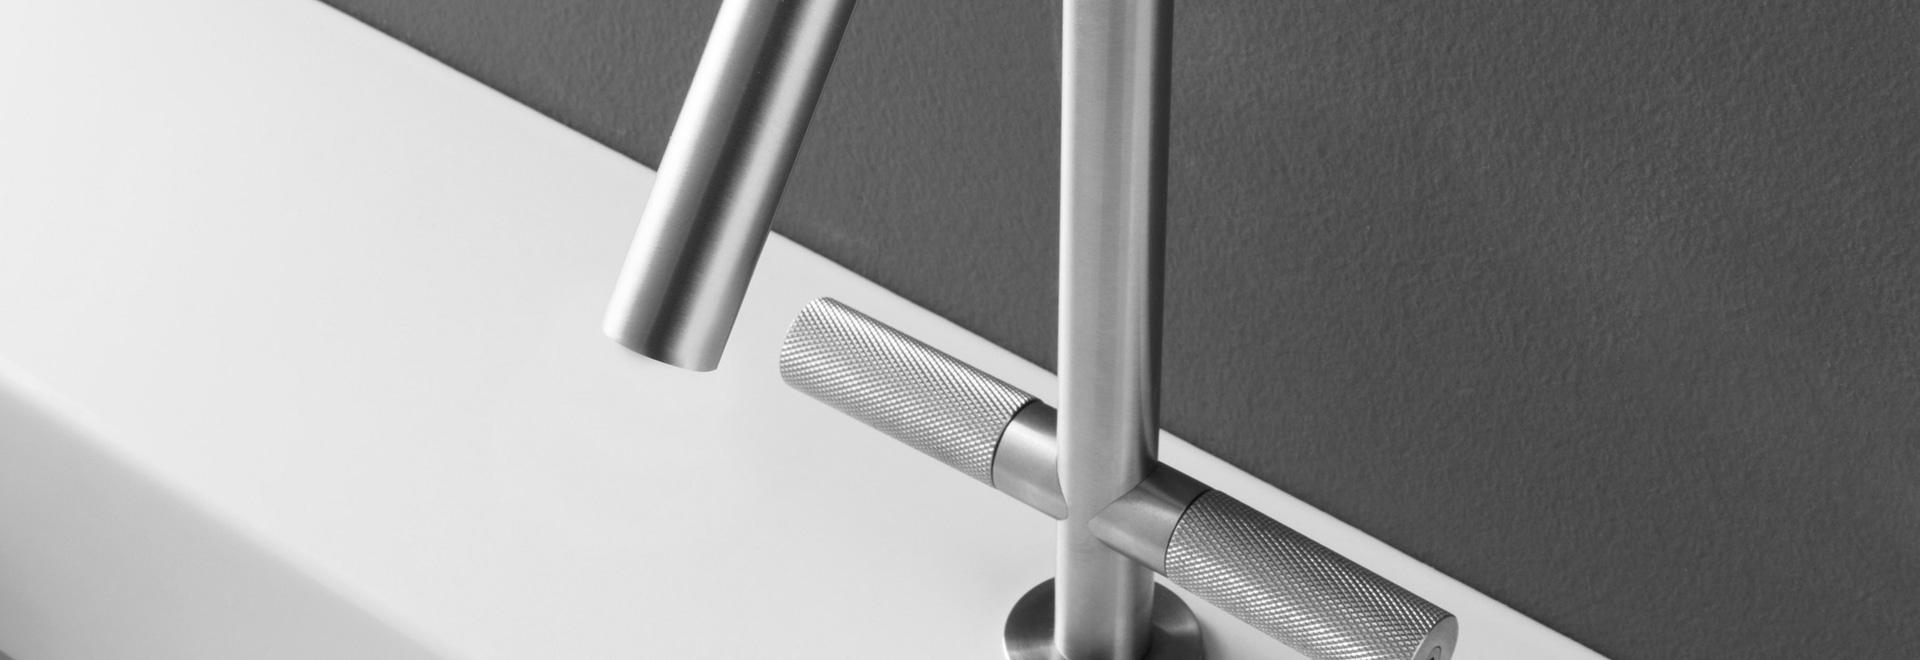 Rubinetterie Treemme:22mm_ design Ing. Castagnoli, Emanuel Gargano, Marco Fagioli